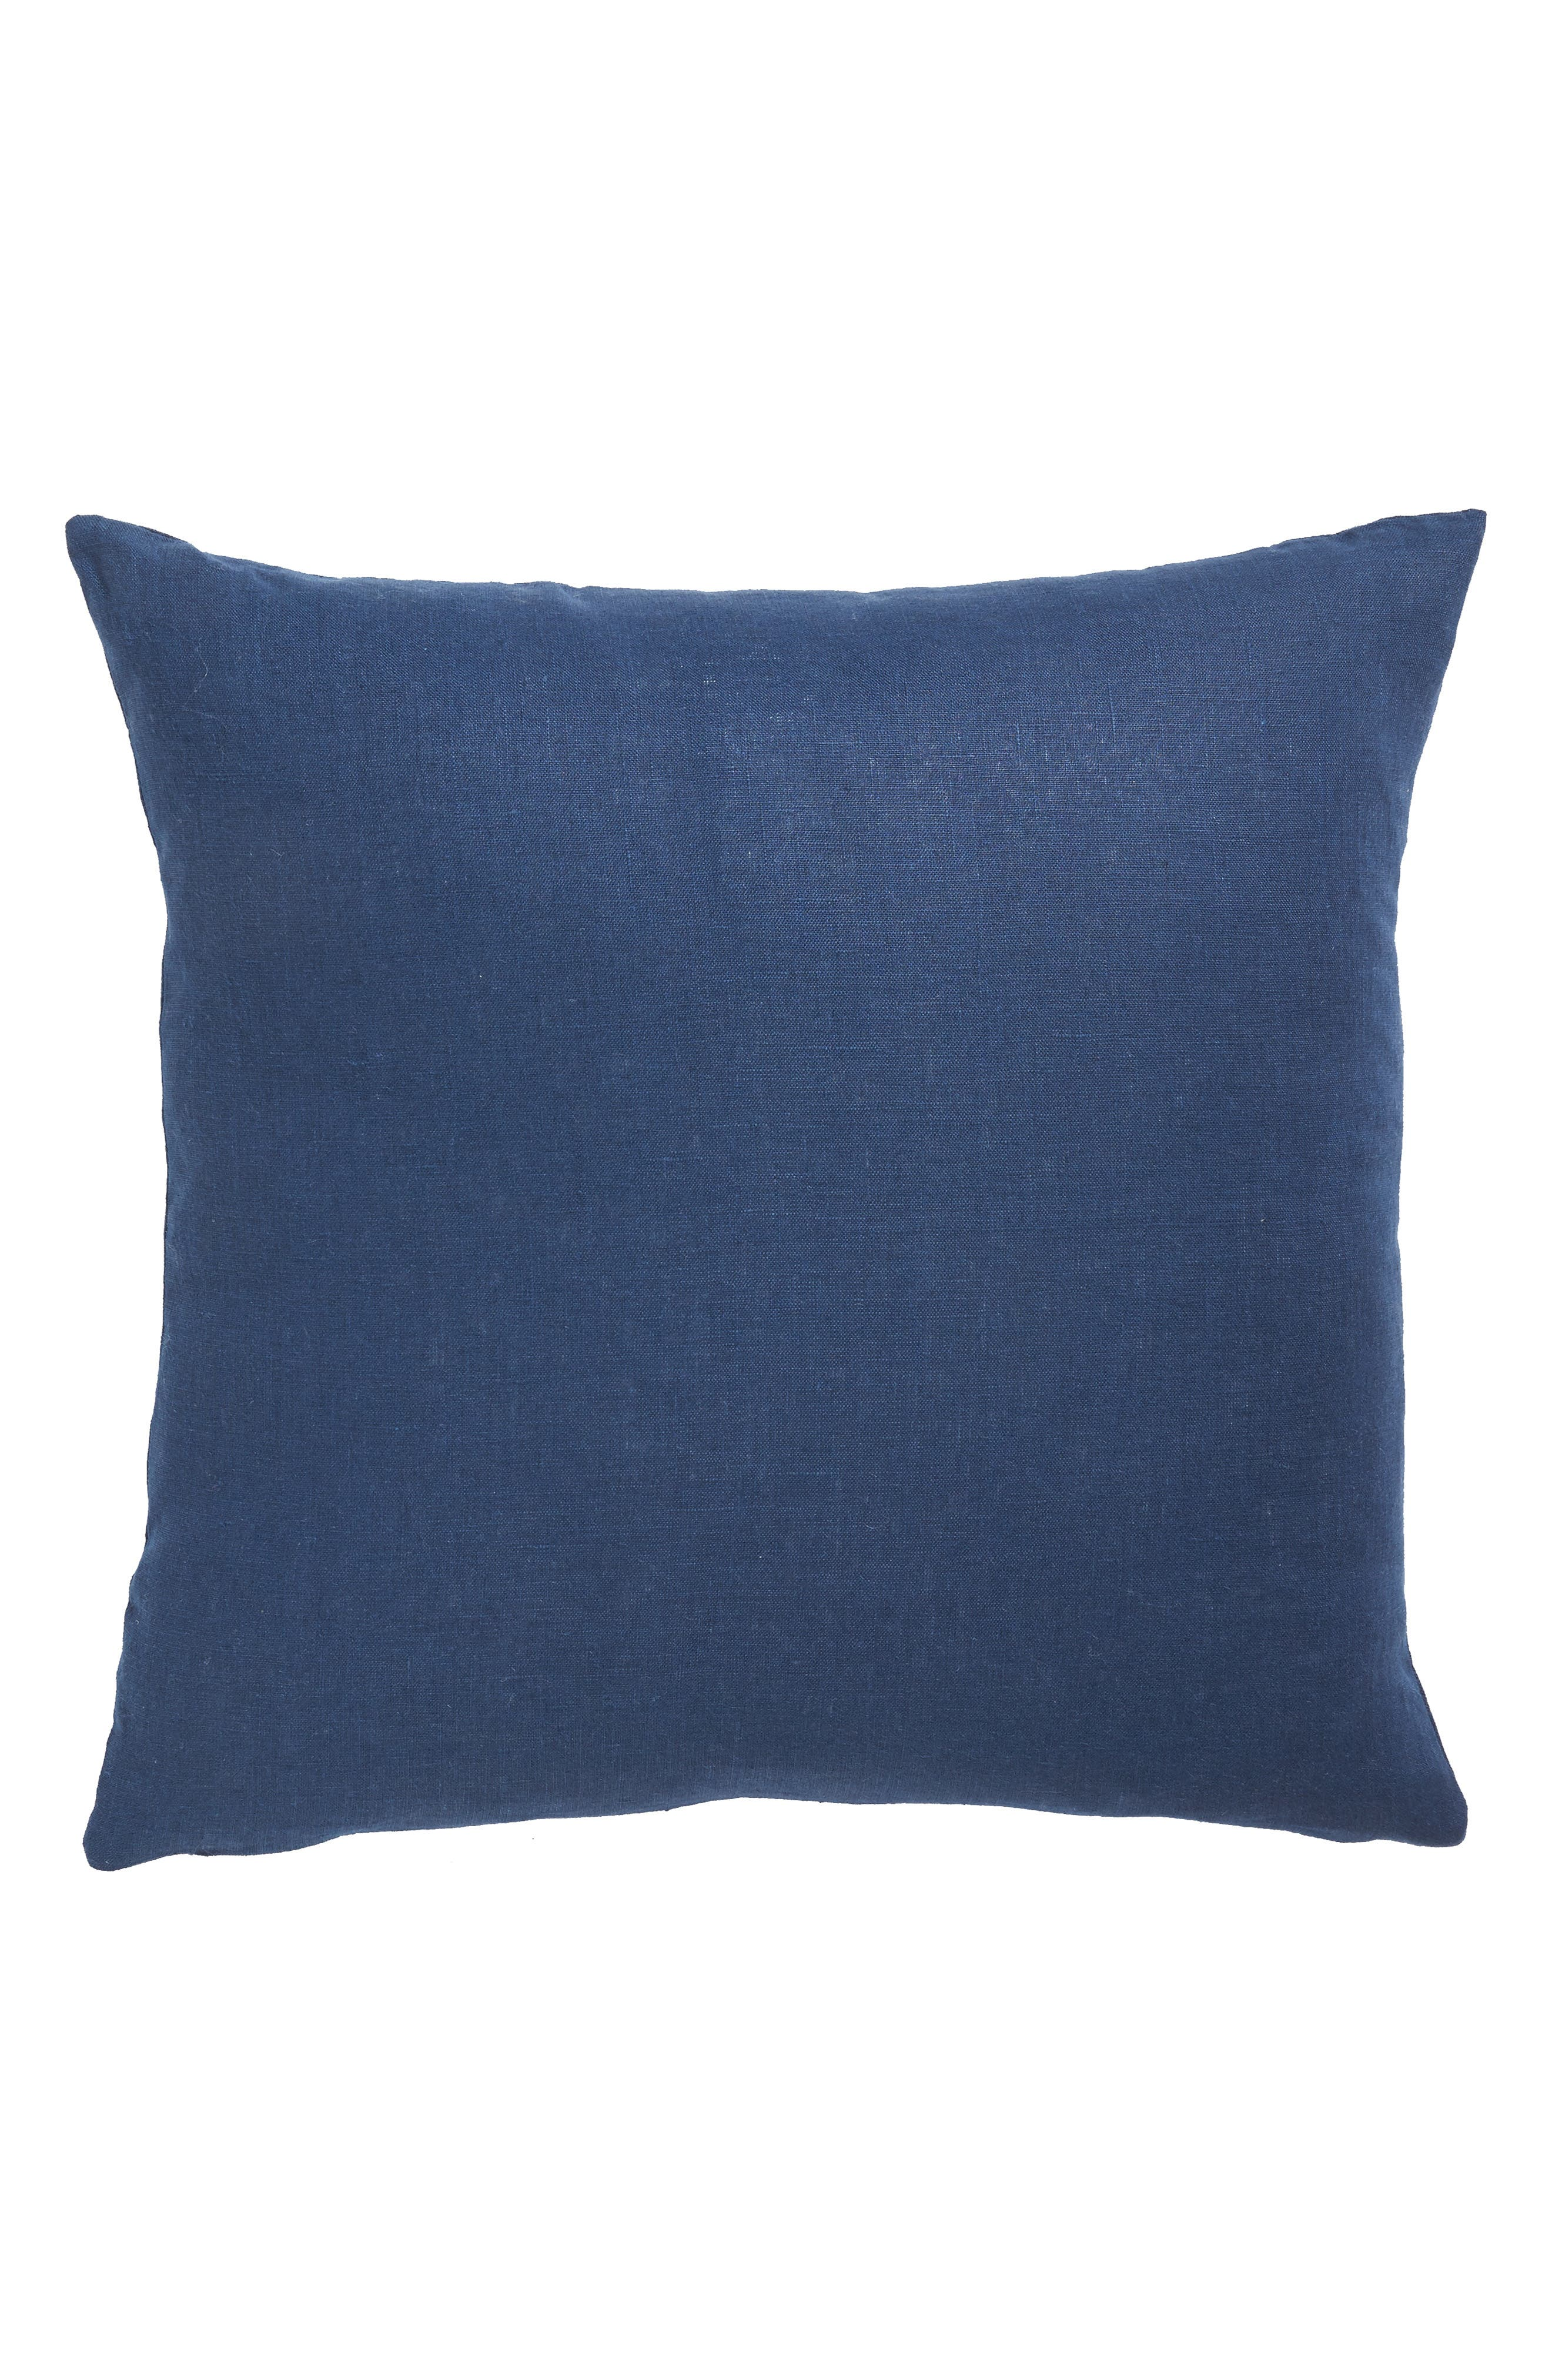 Corana Linen Pillow,                             Alternate thumbnail 2, color,                             NAVY/WHITE